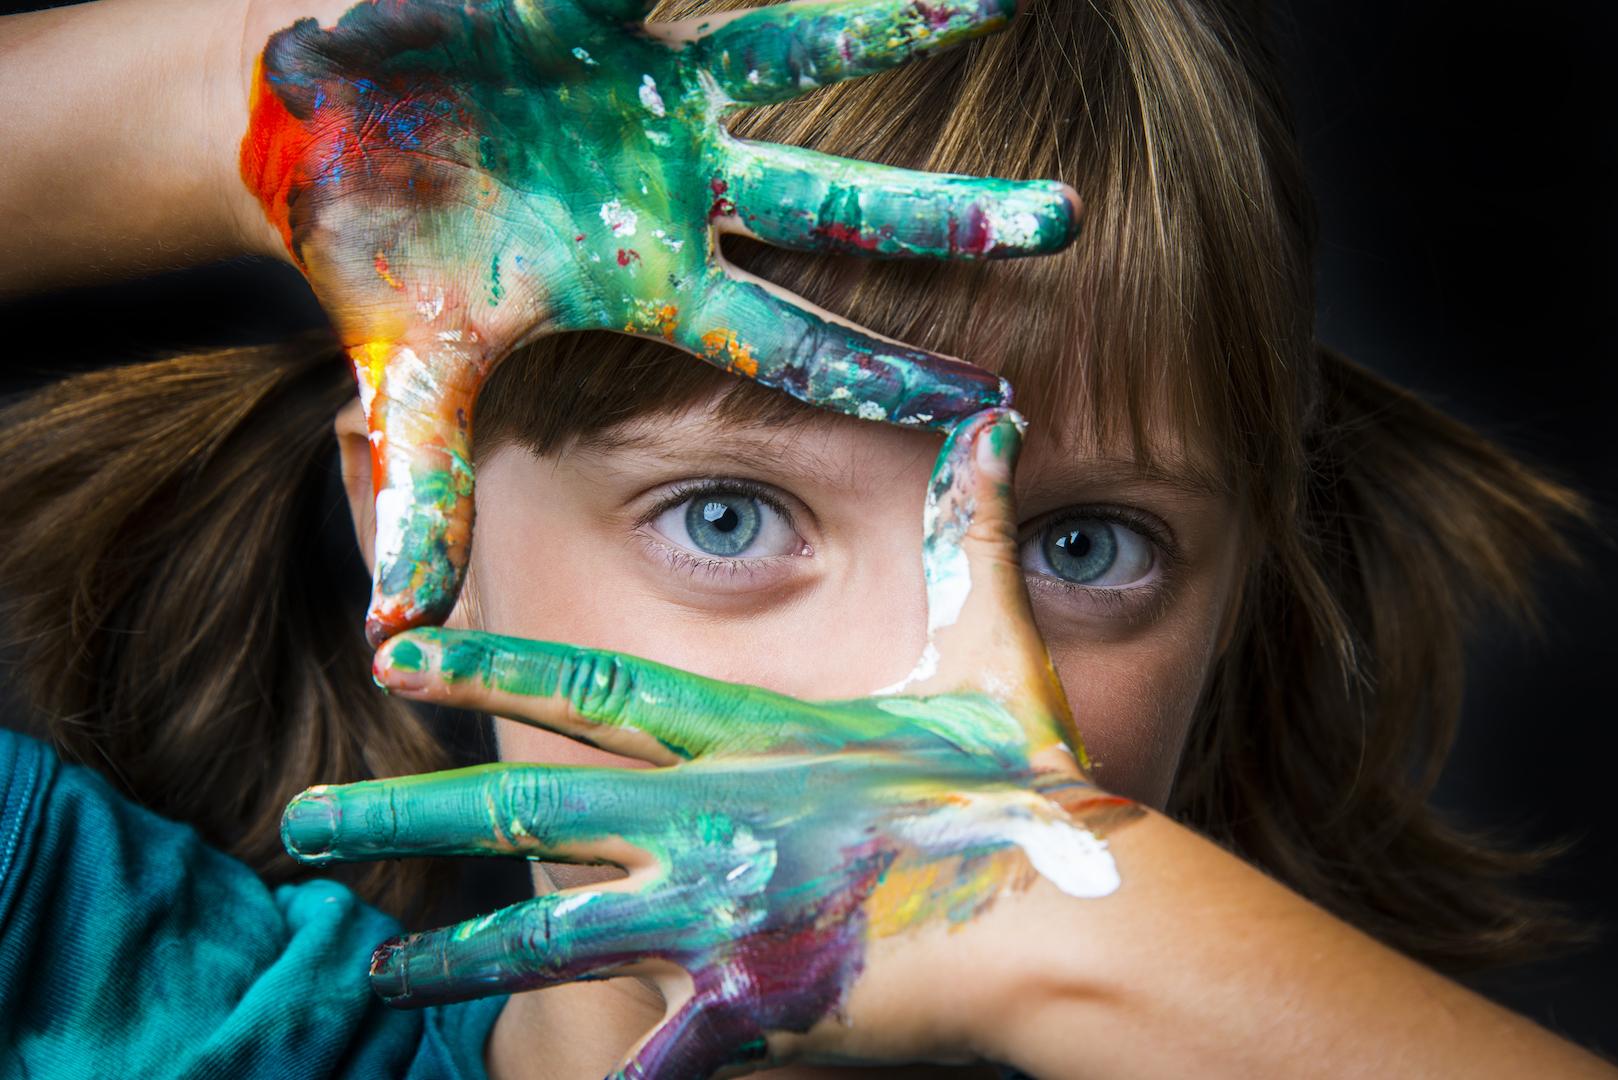 These 'creativity genes' allowed people to take over the world wSPdktshmqvhWPVwByCKri